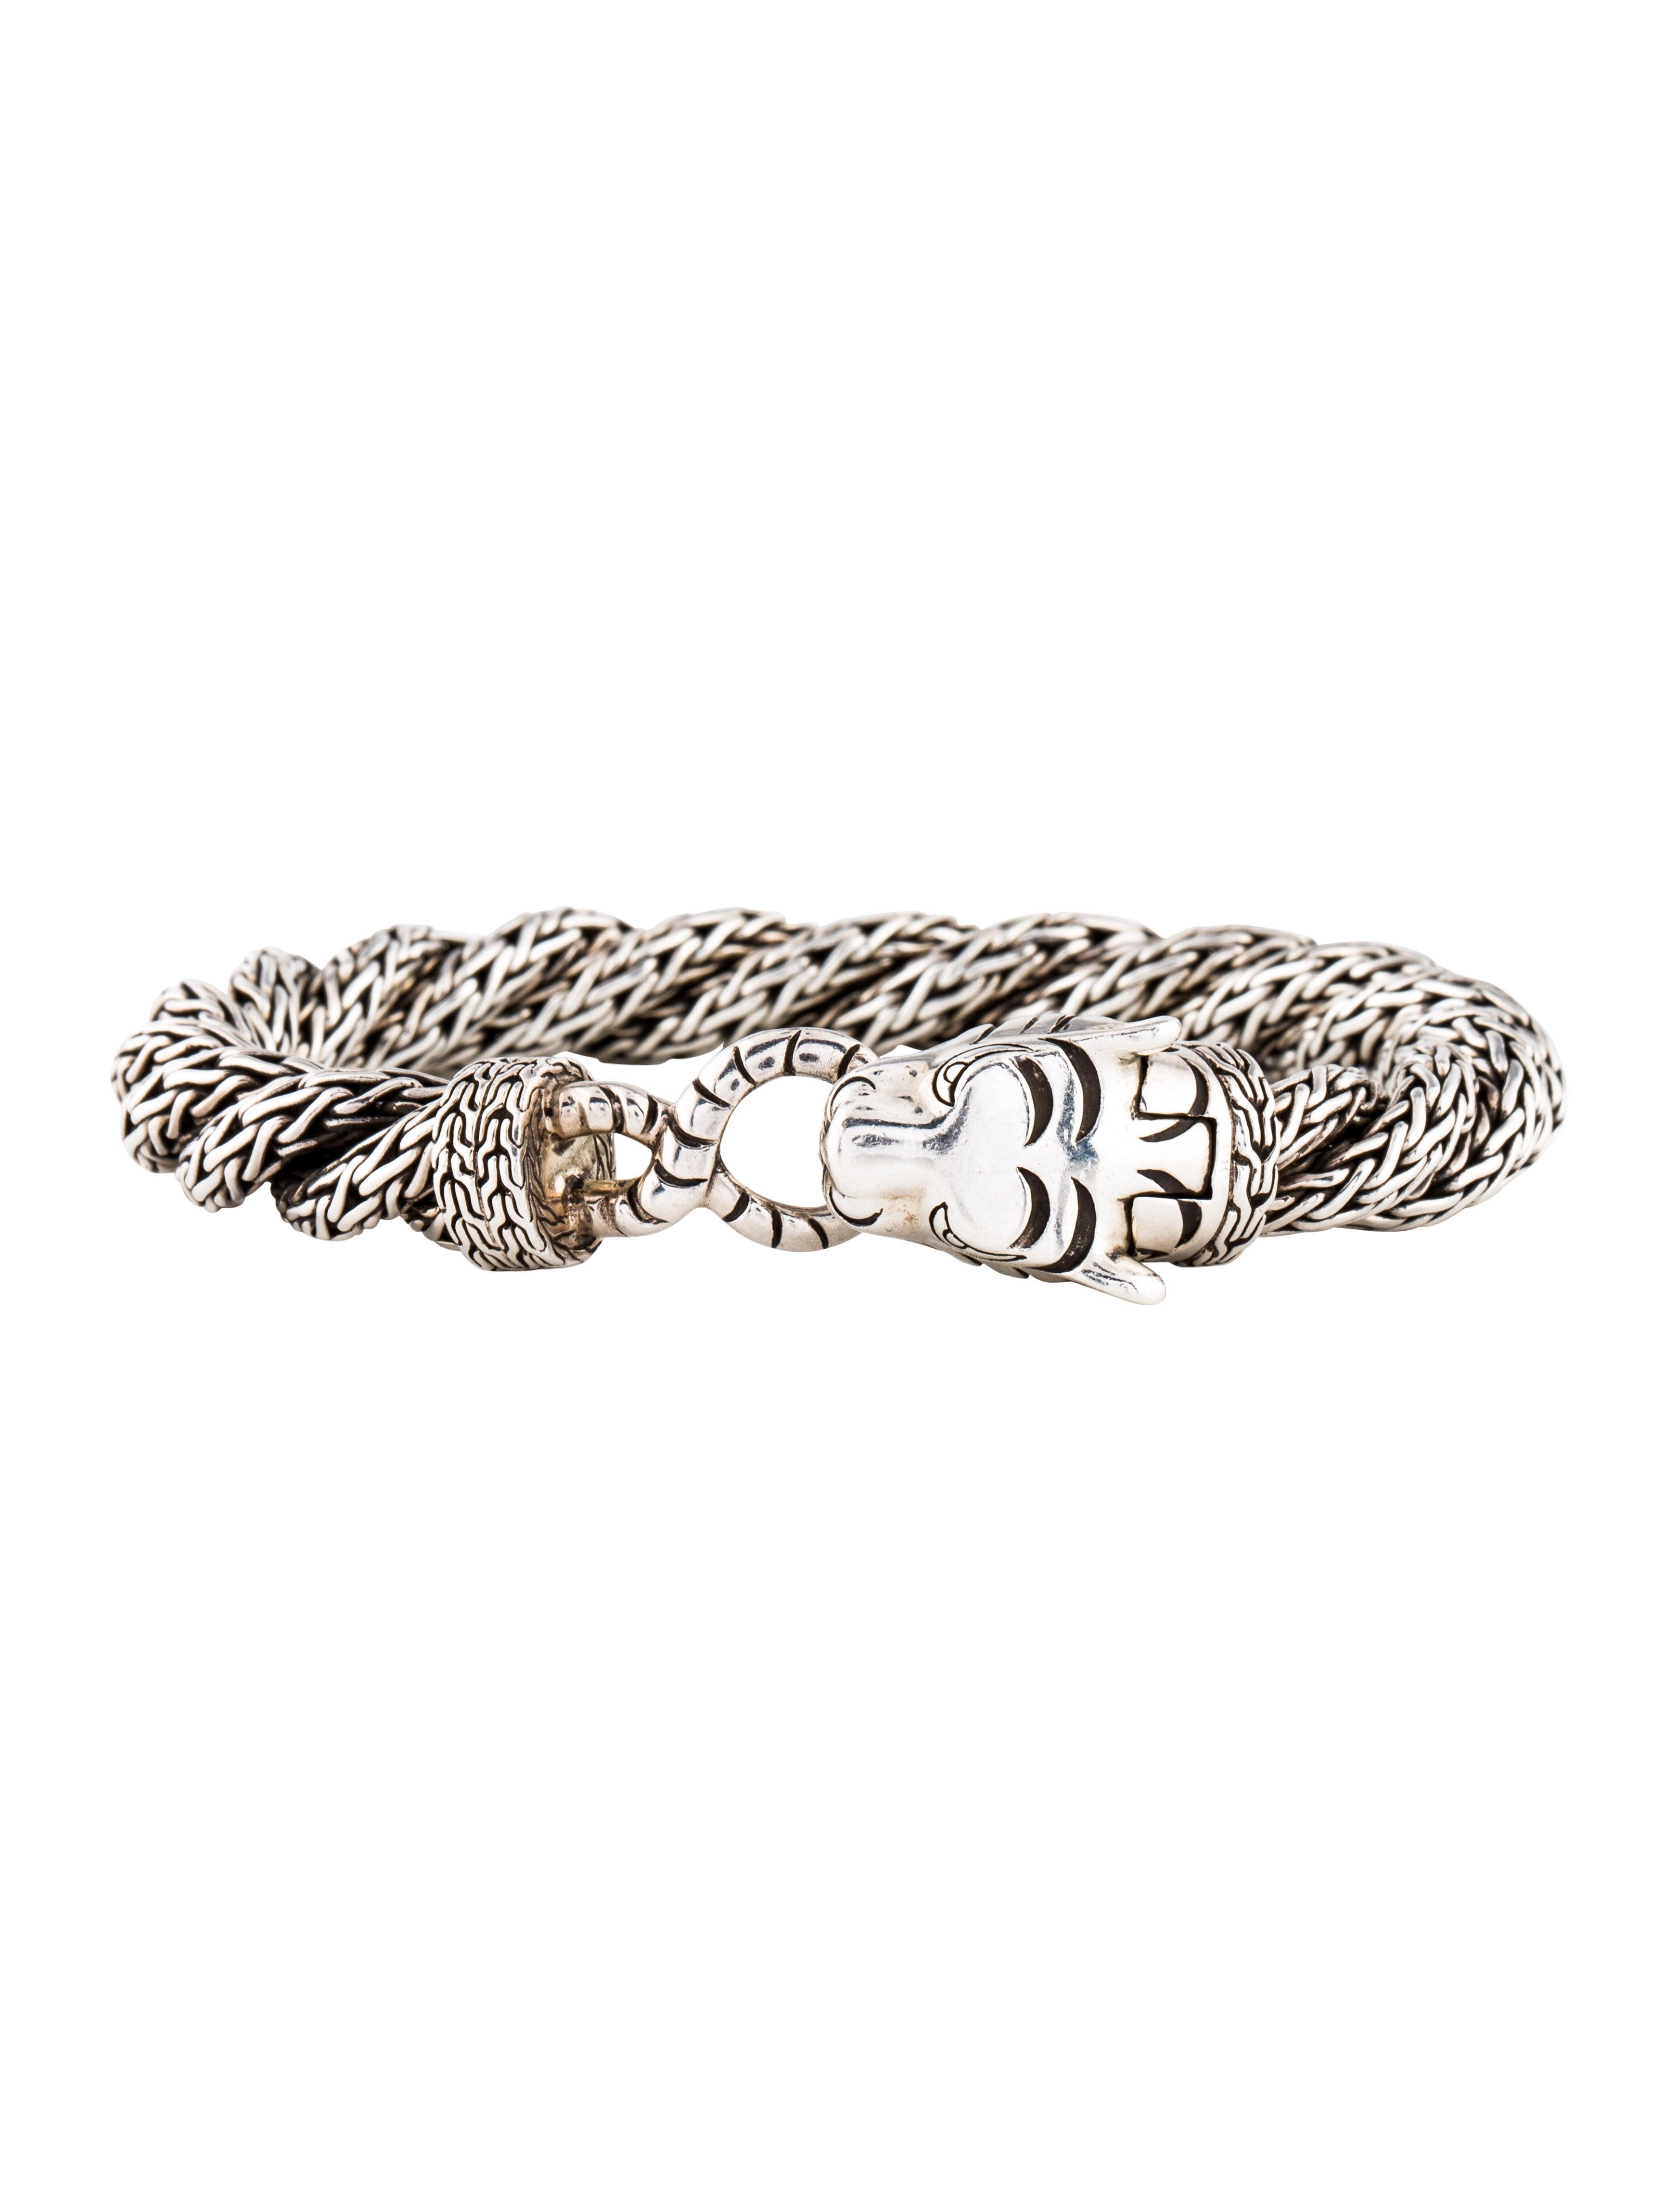 John Hardy Tiger Bracelet Jewelry Flatheadlake3on3